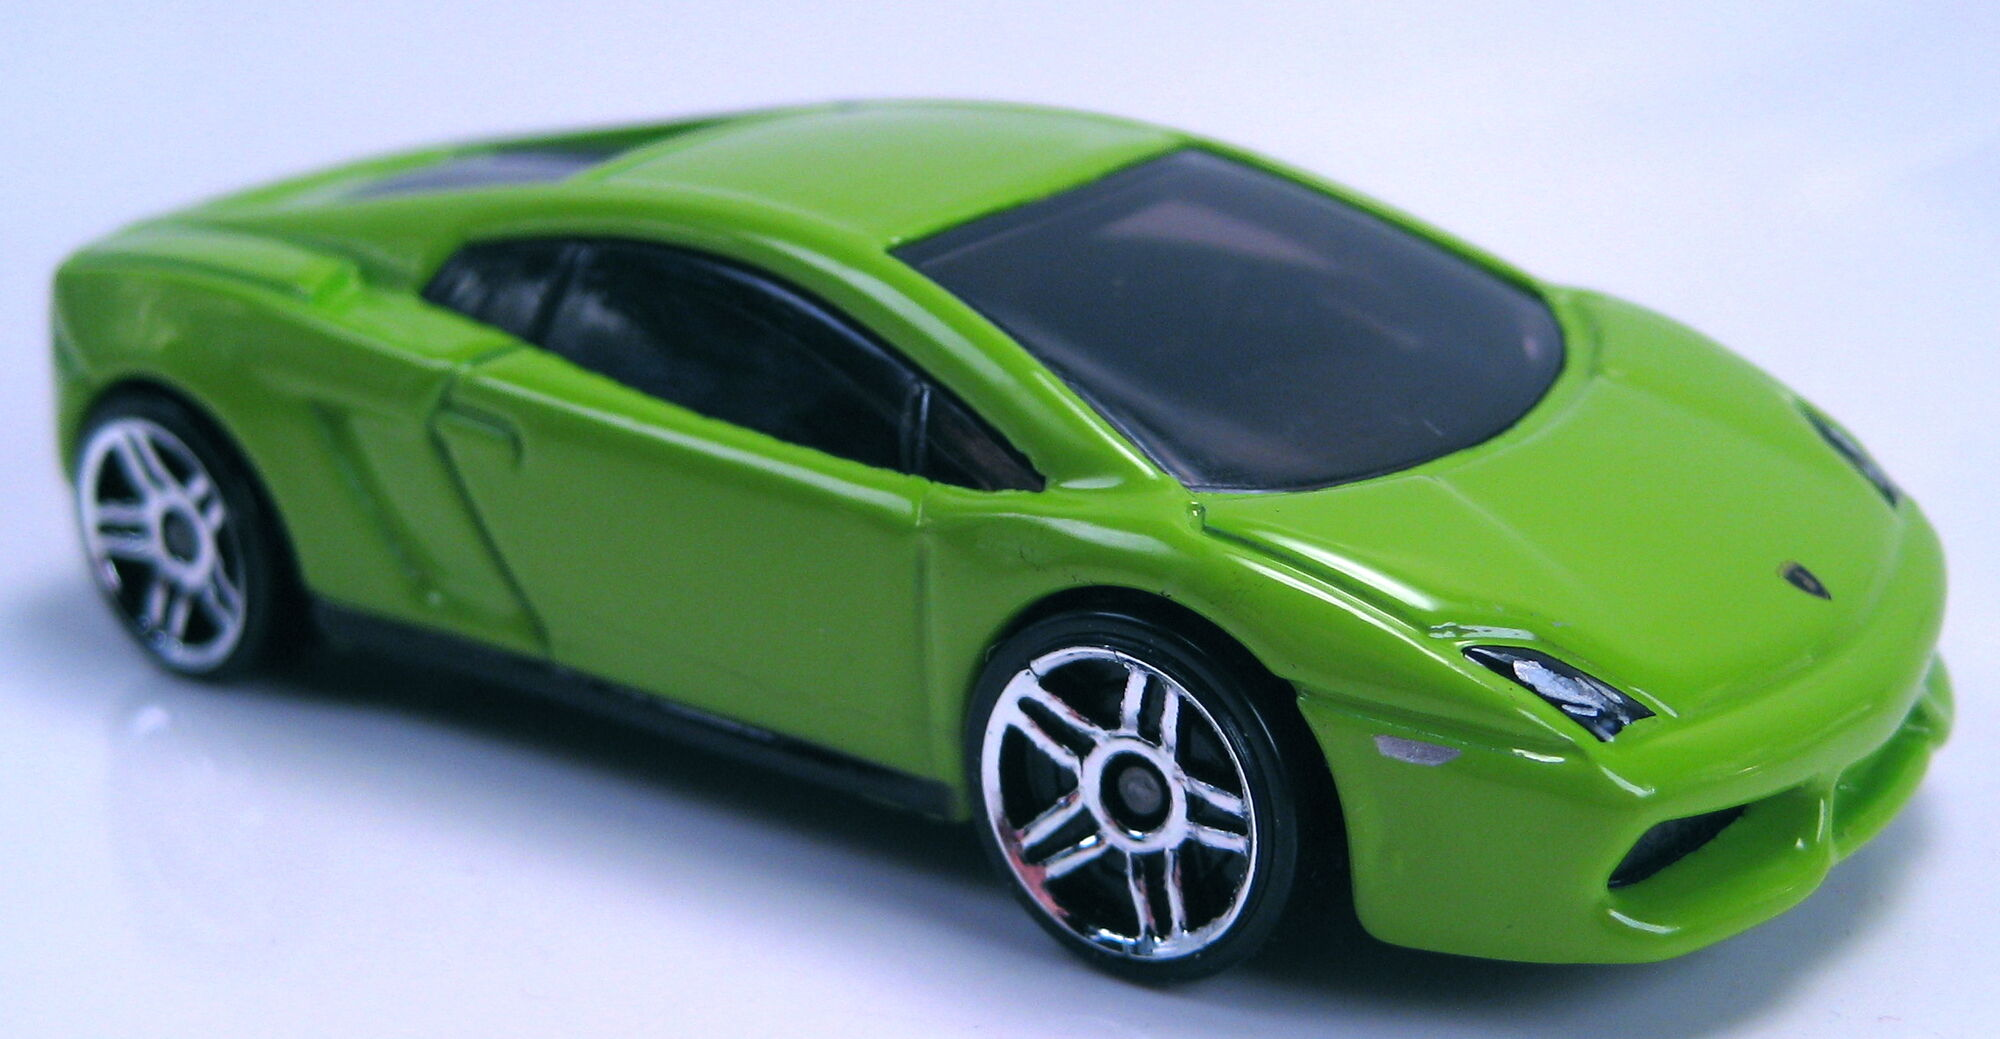 2000?cb=20121128005947 Surprising Lamborghini Gallardo Hot Wheels Wiki Cars Trend